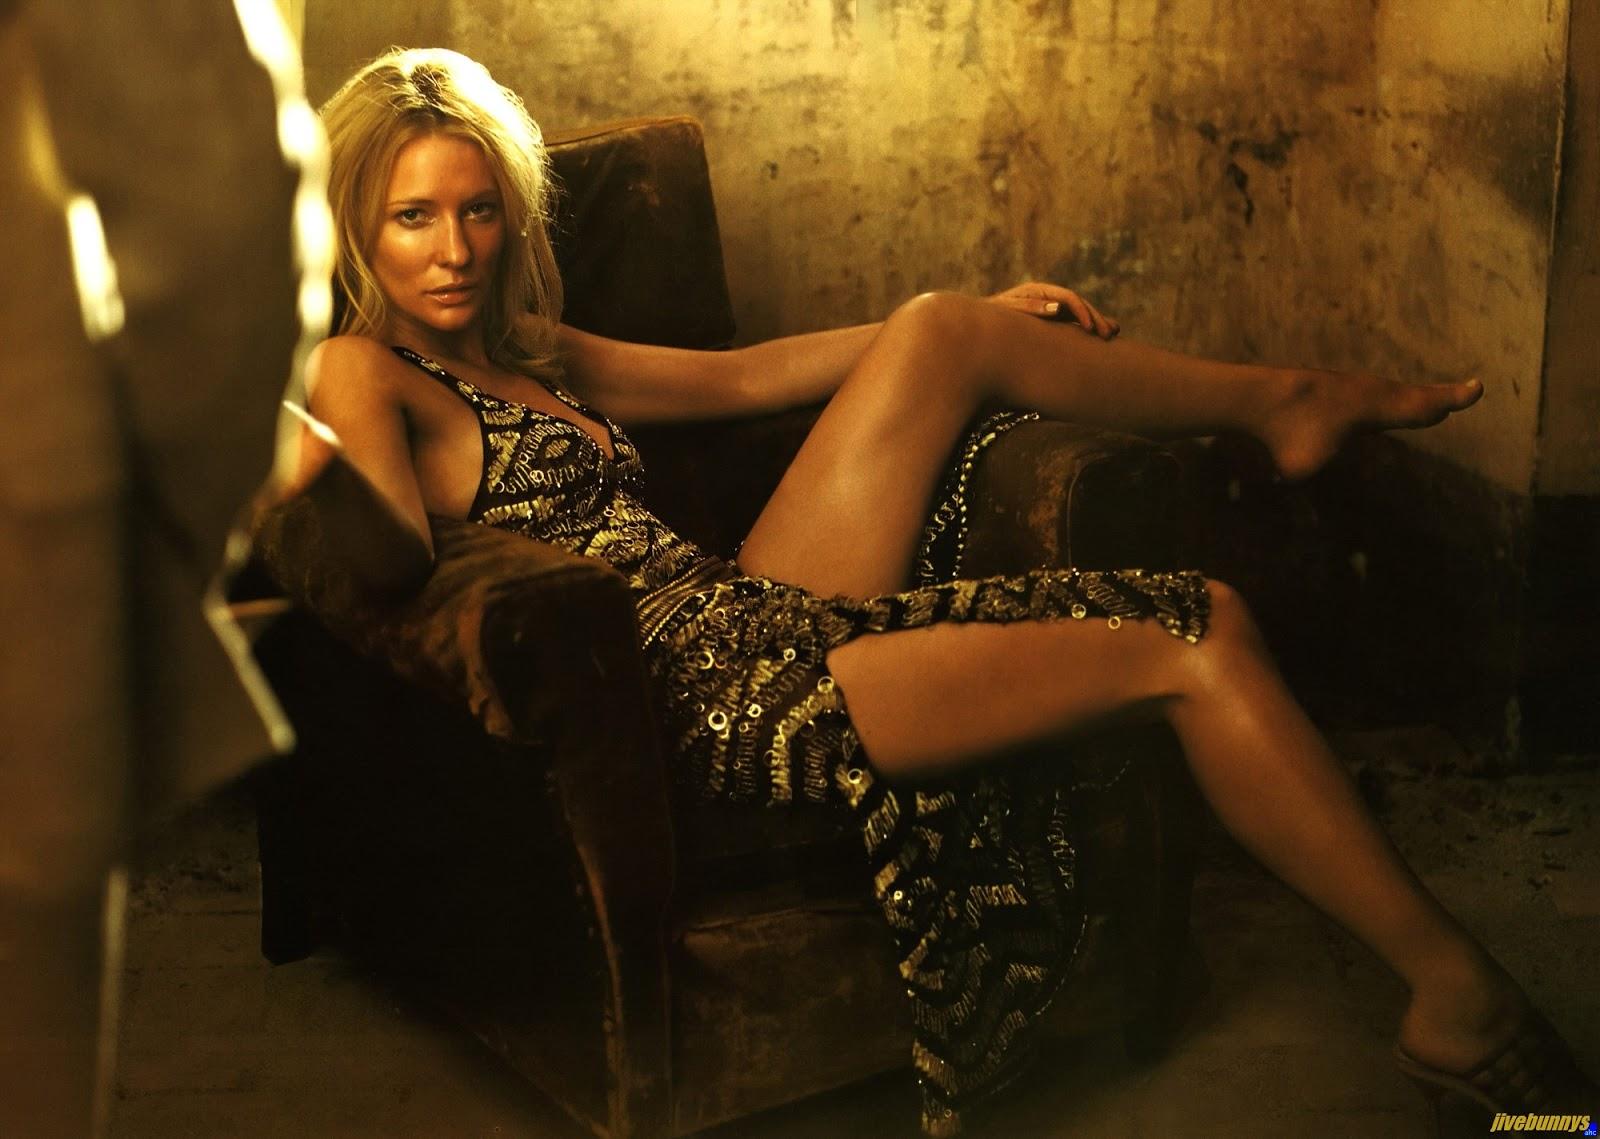 Cate Blanchett Foto Desnuda